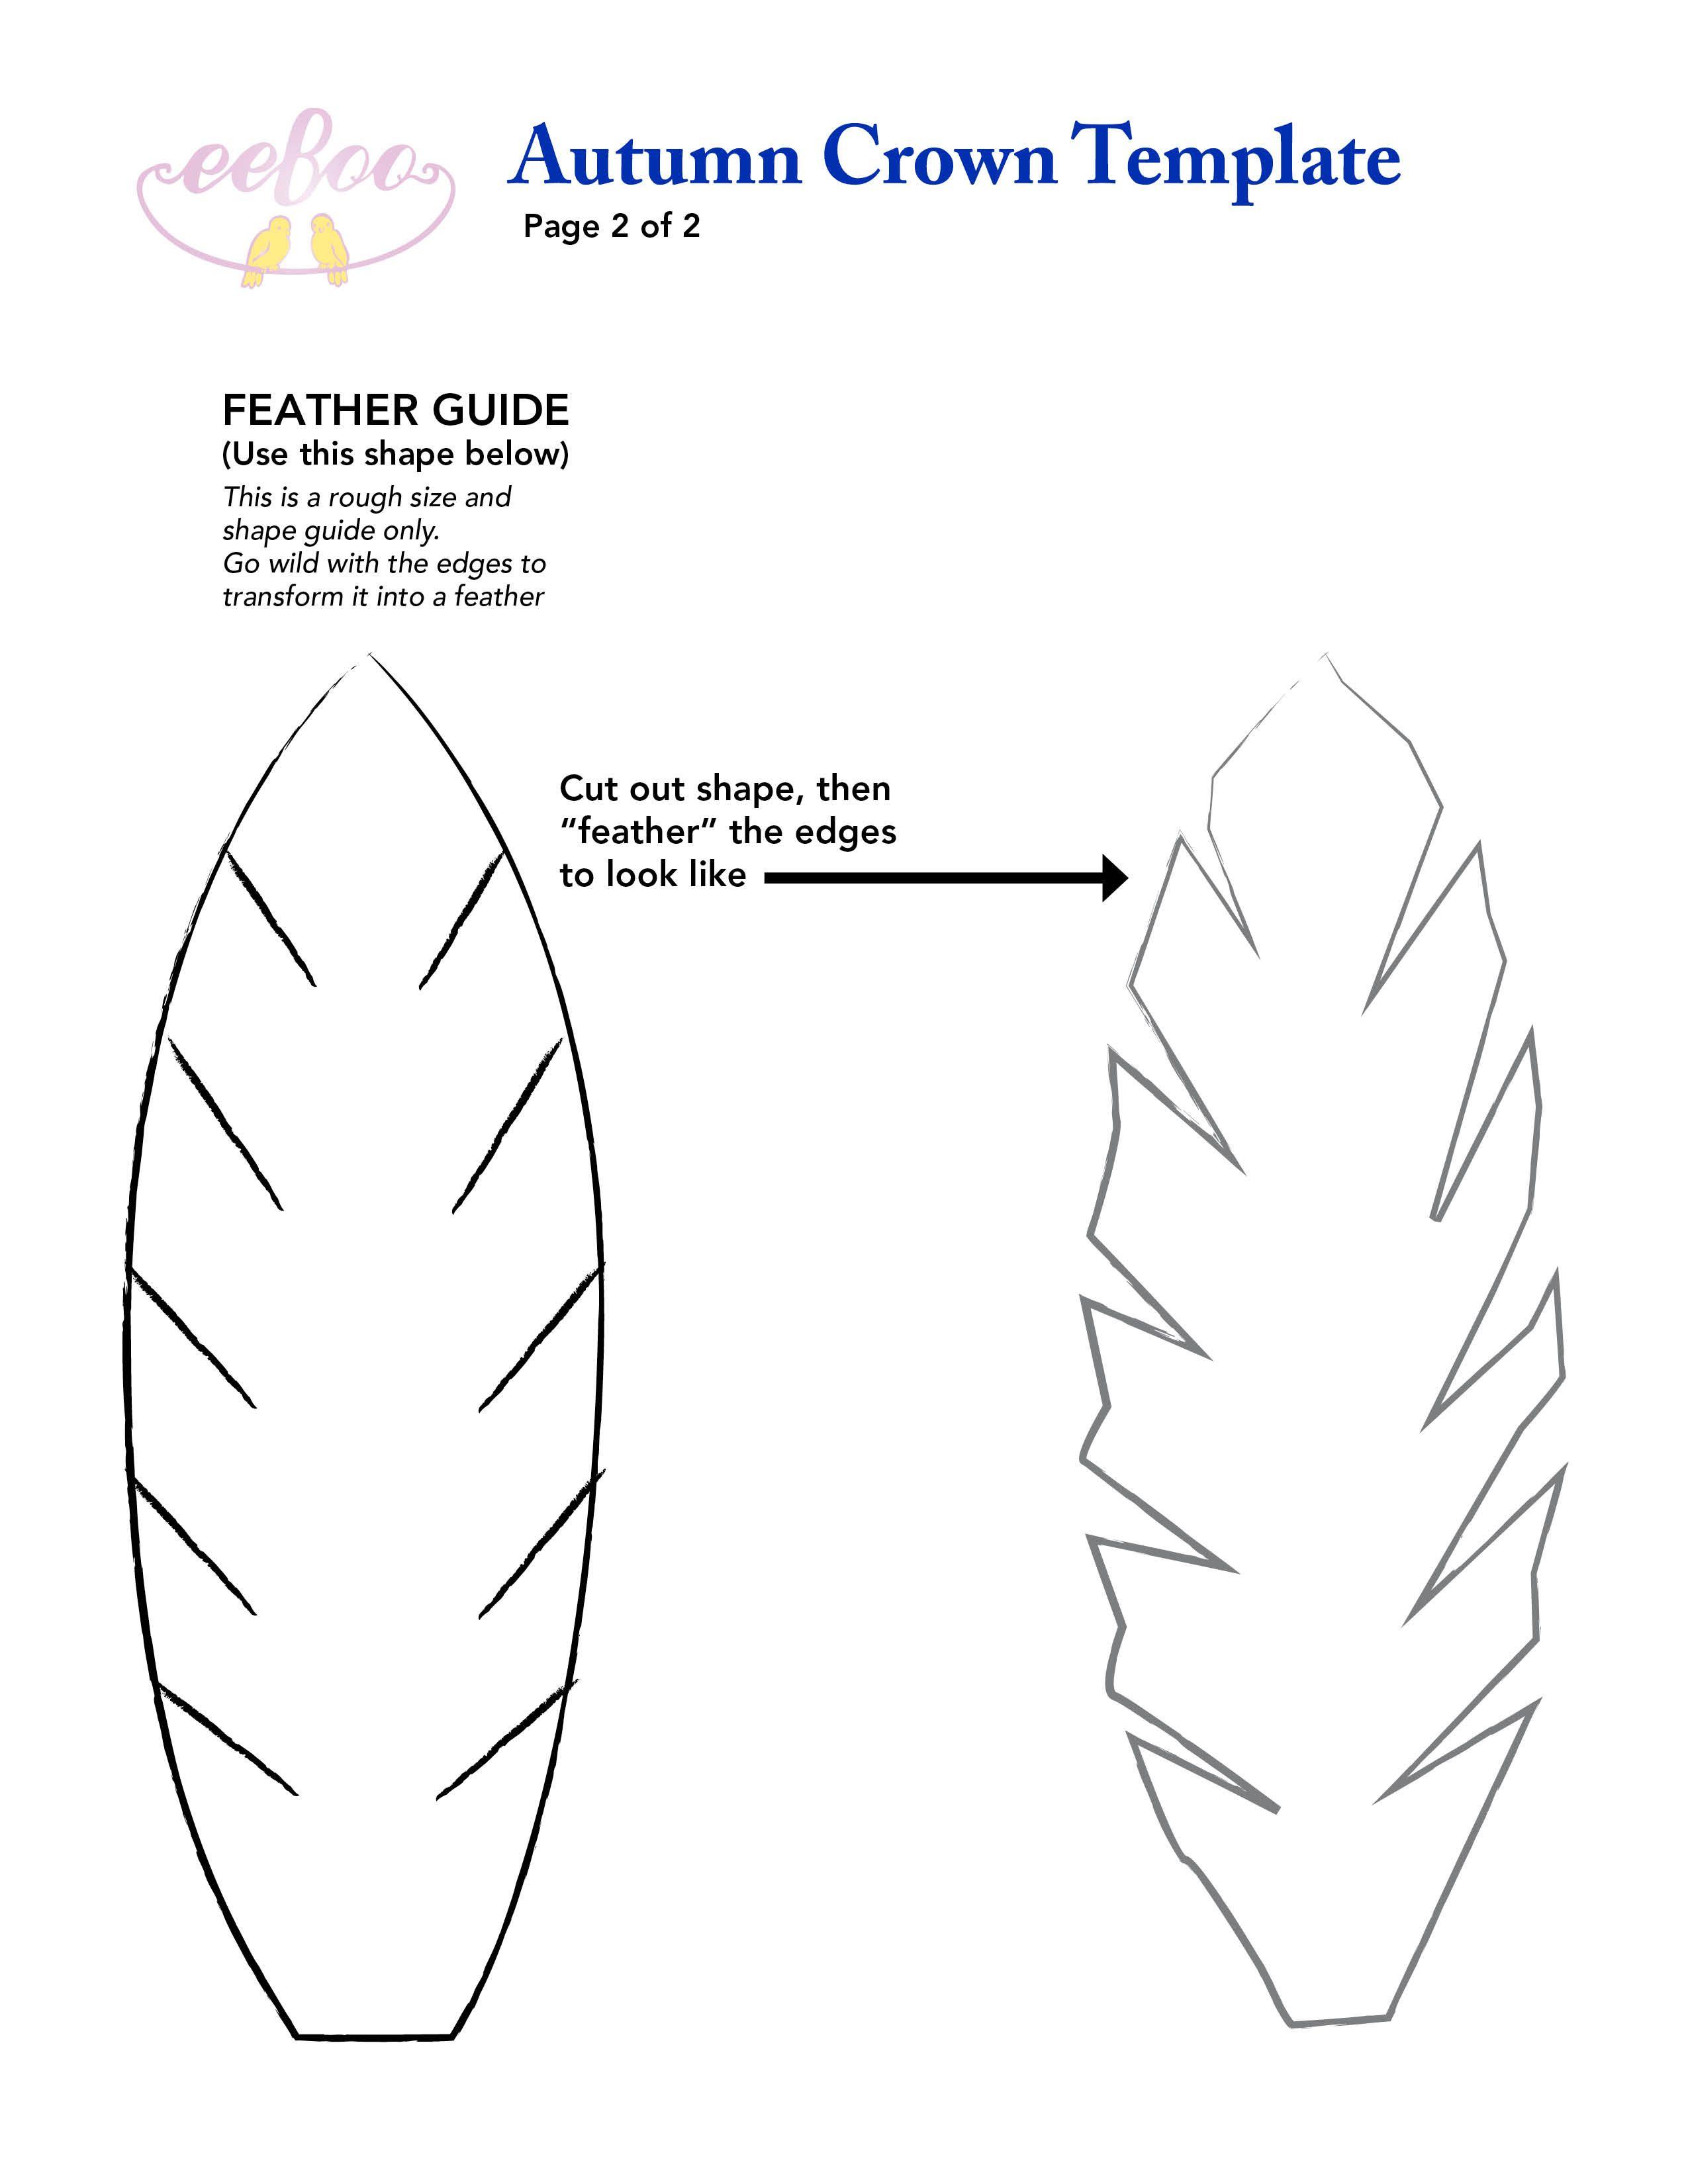 Pin By Eeboo On Be Crafty With Eeboo Feather Template Felt Diy Feather Diy